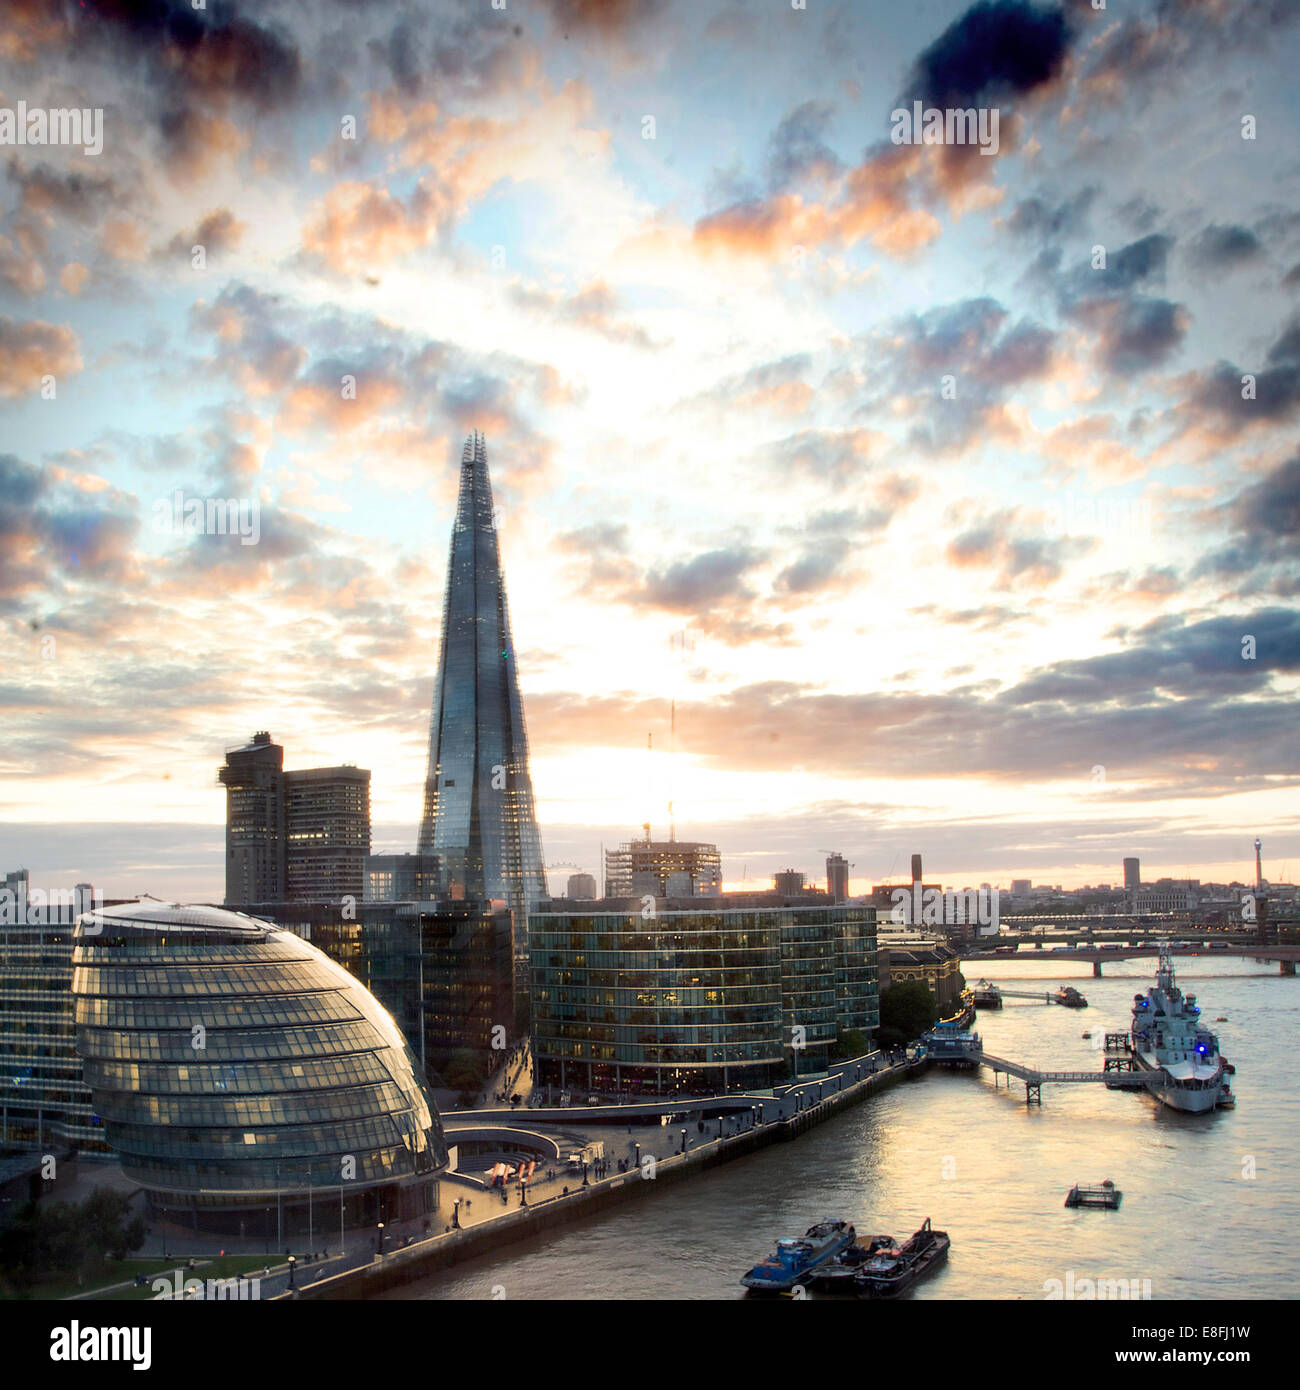 City Skyline, London, England, UK Stockbild